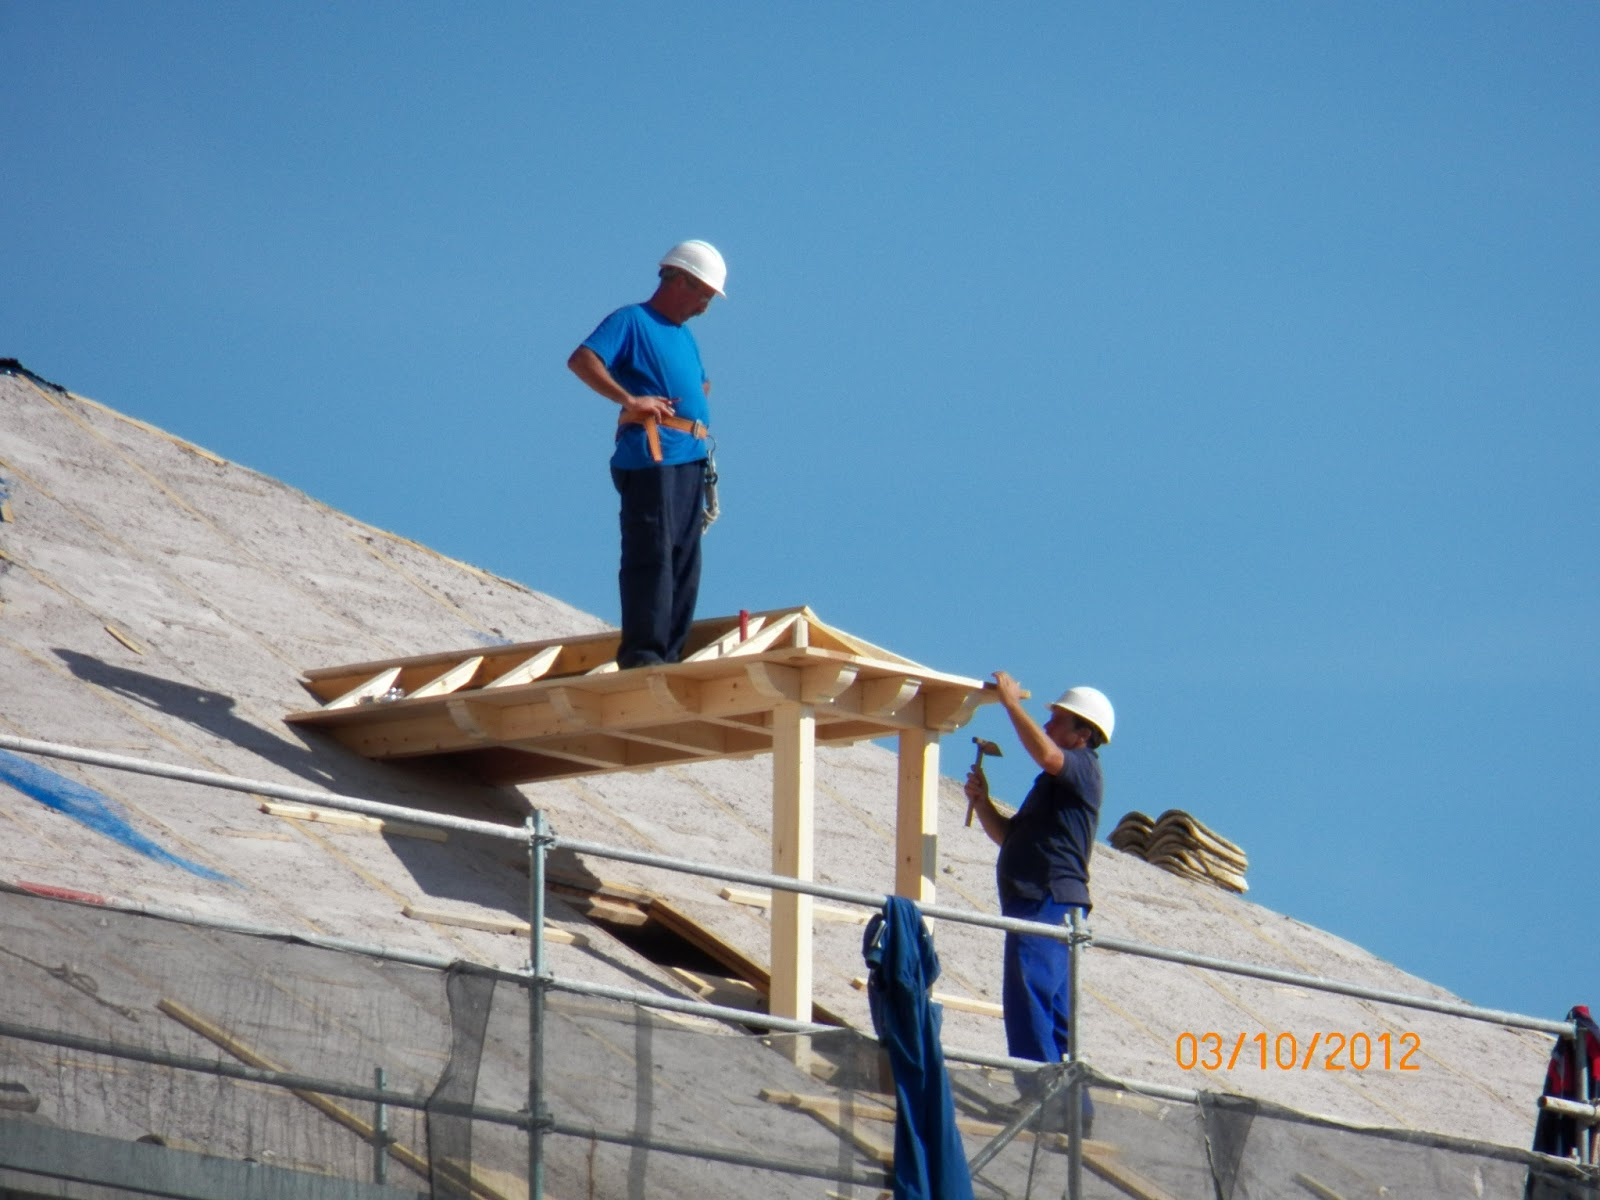 Todo tembleque obras de la restauraci n de la iglesia for Restauracion tejados de madera